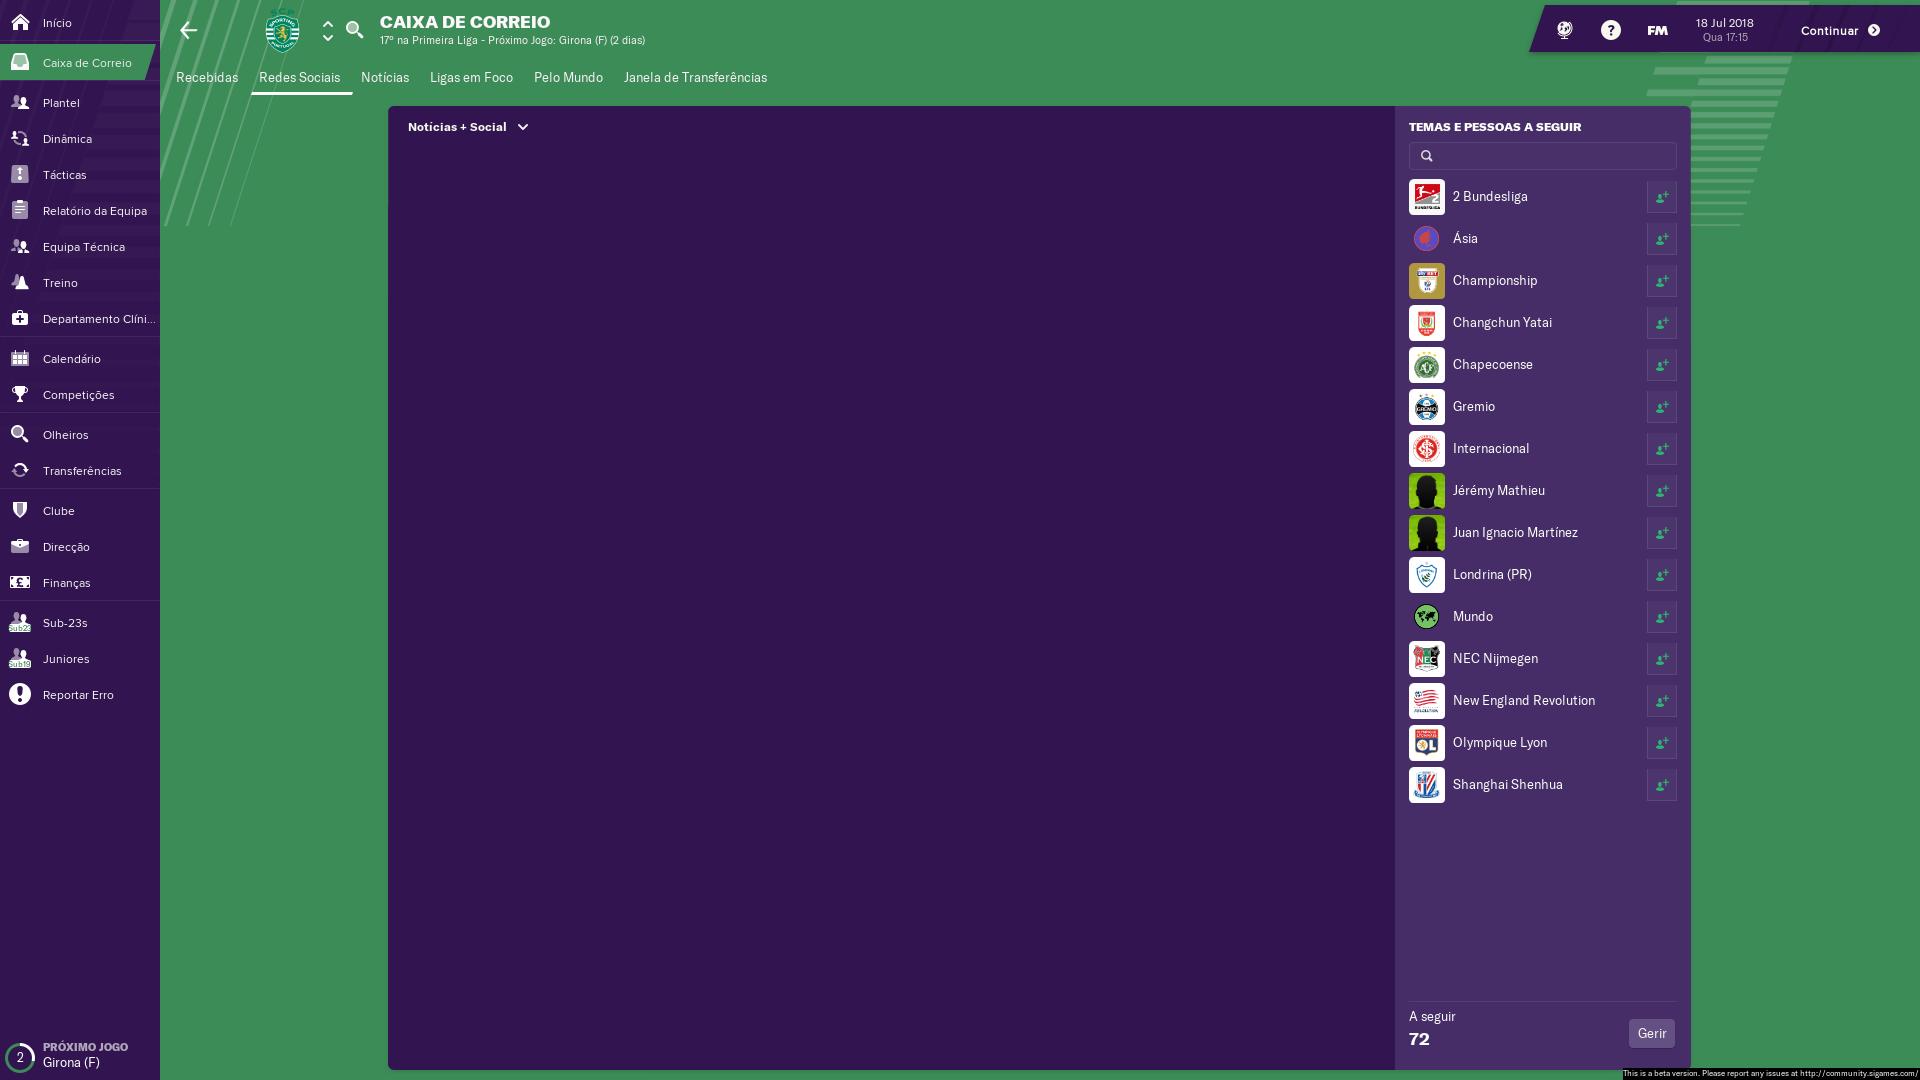 Calendario Bundesliga 2.News Social Screen At A Blank User Interface Issues